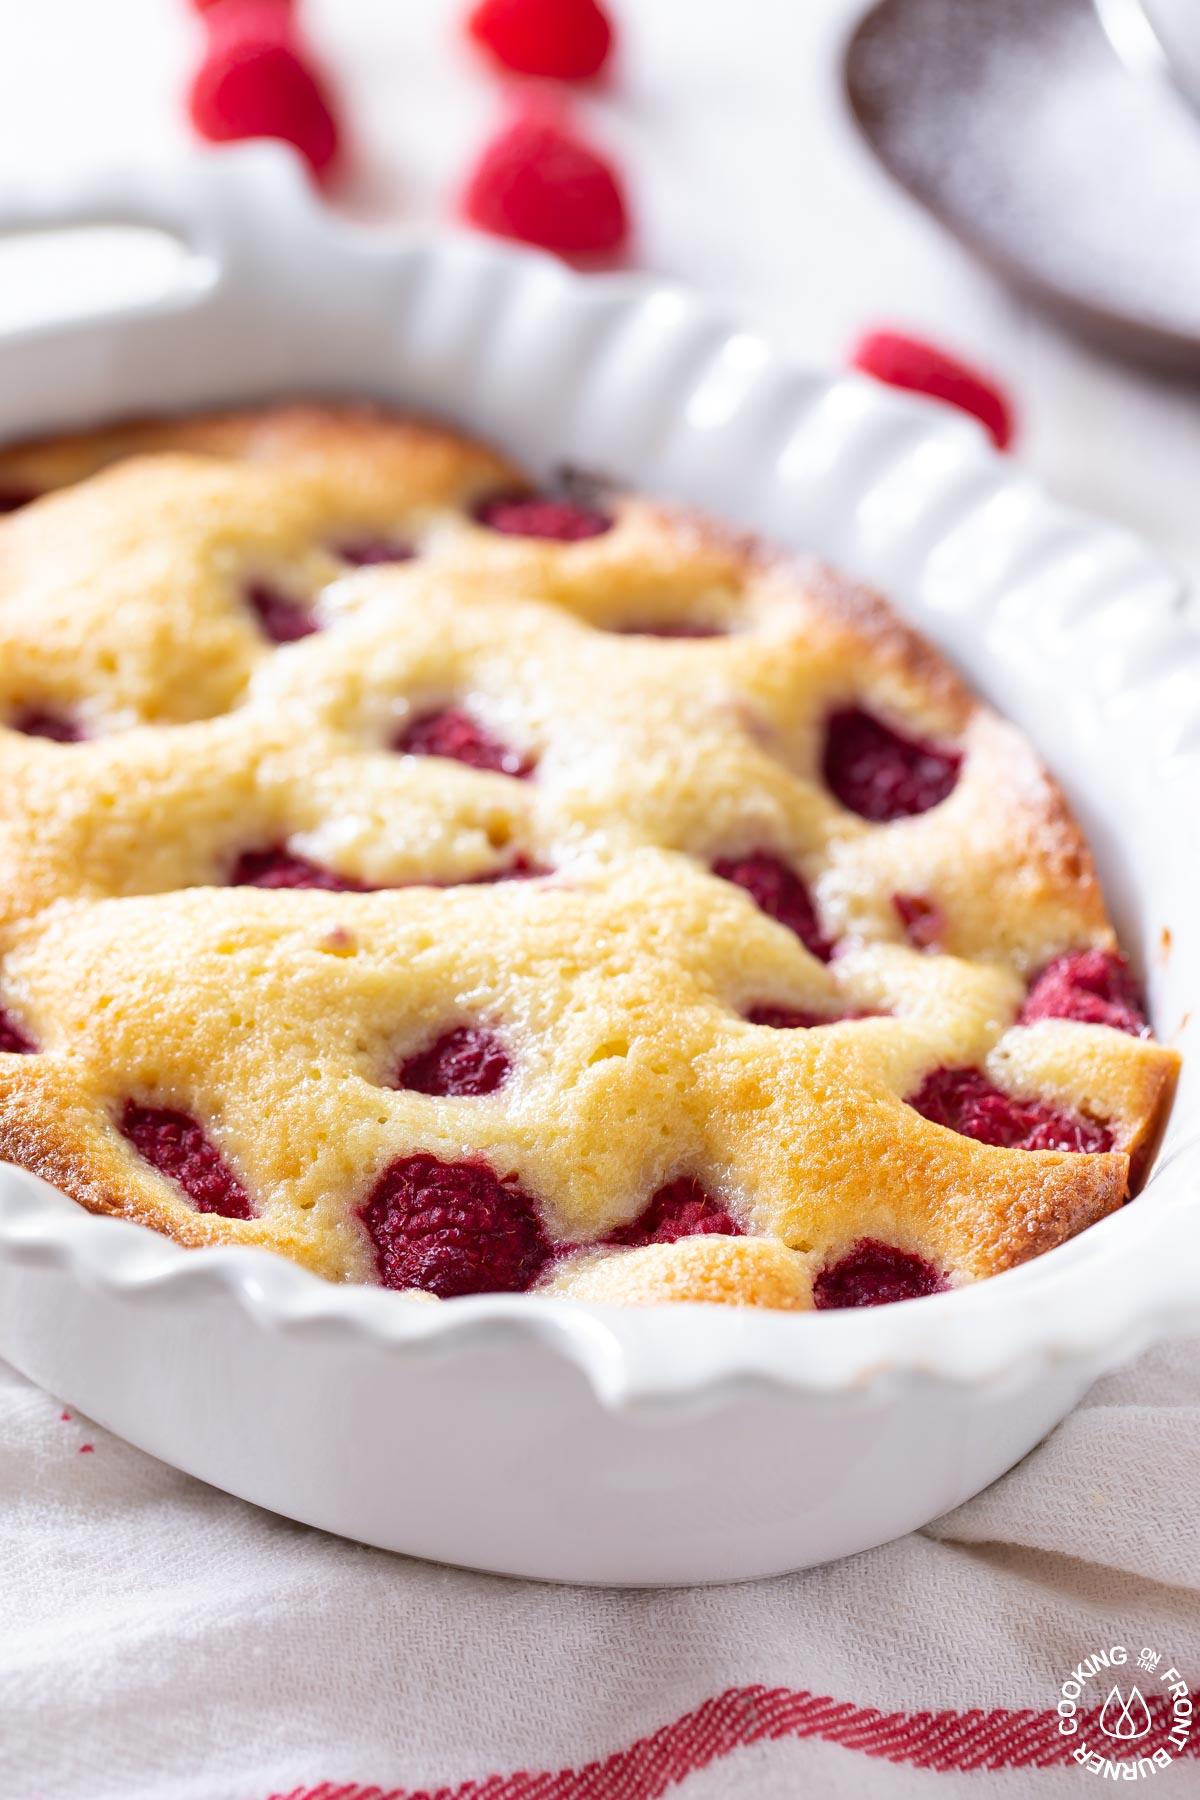 baked lemon raspberry buckle cake in a white baking dish